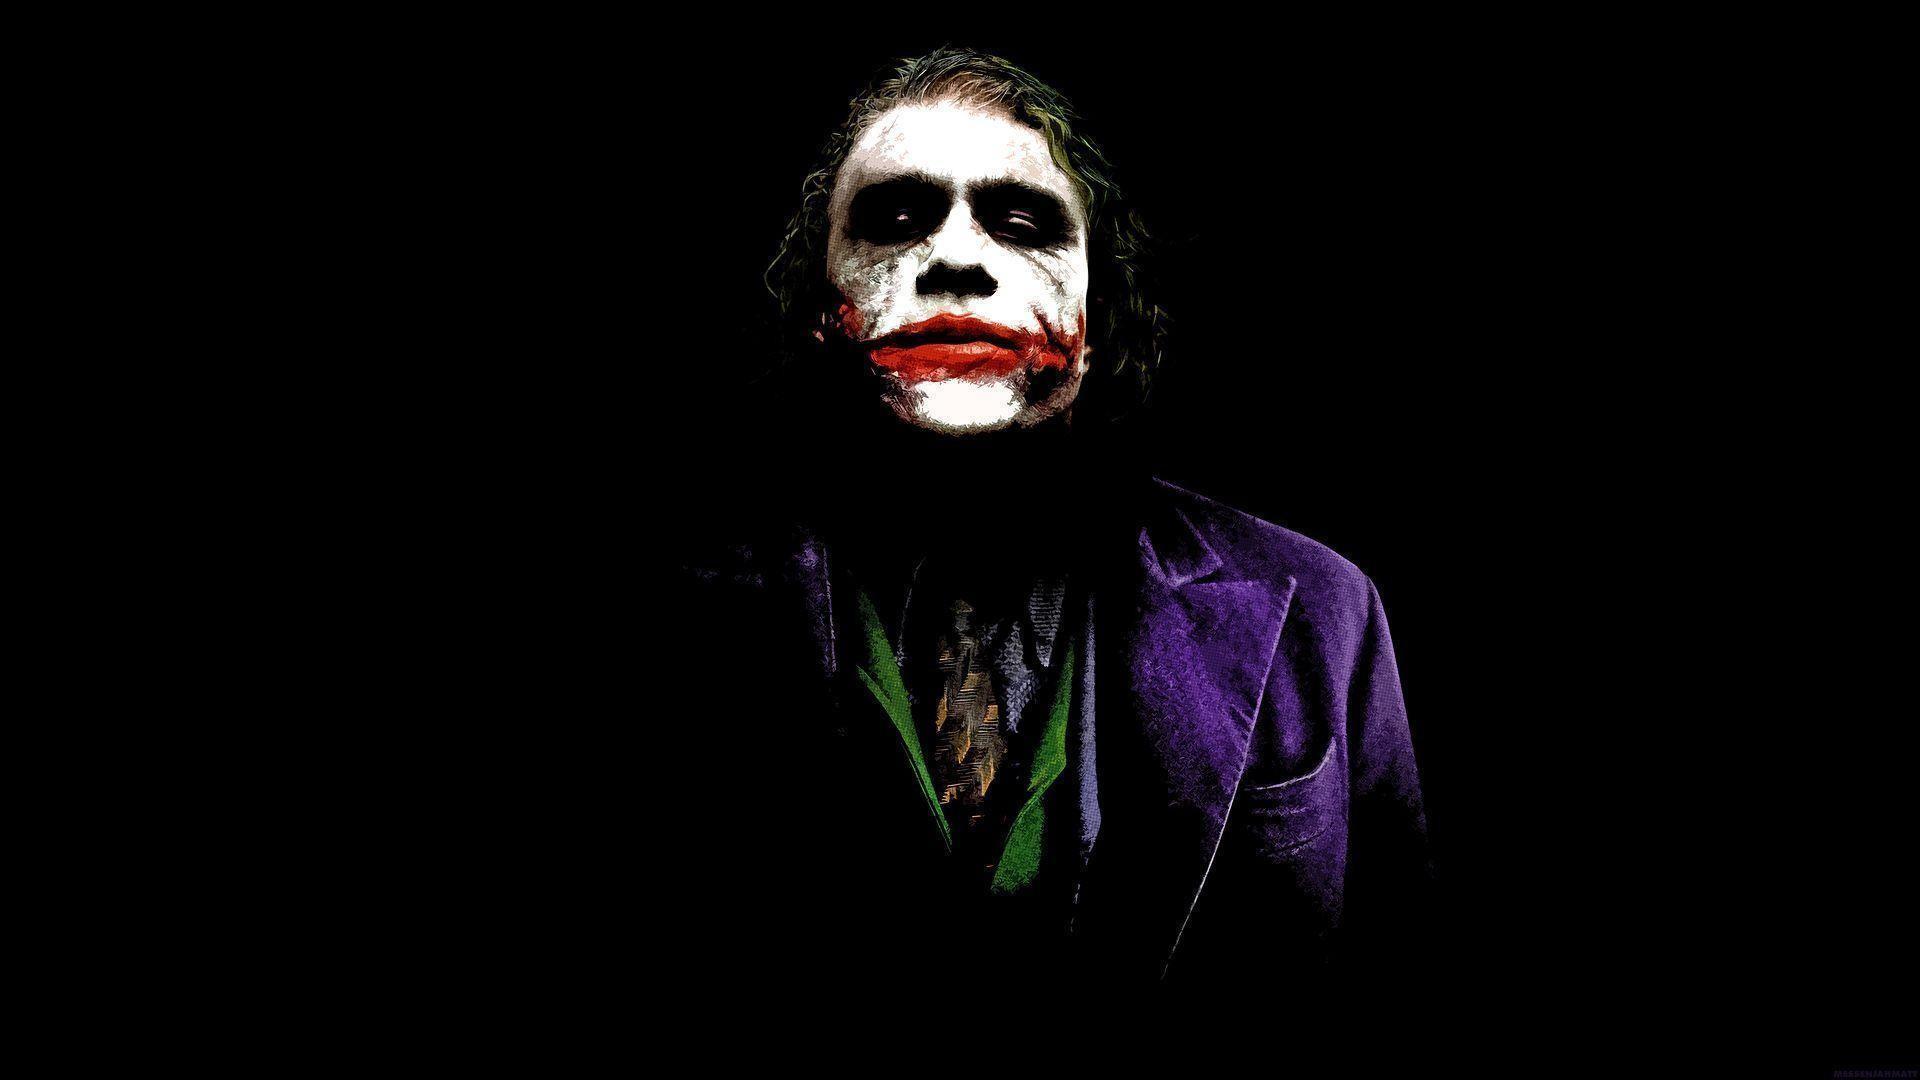 Movie Joker Wallpaper For Desktop 14 HD Wallpapers | aladdino.